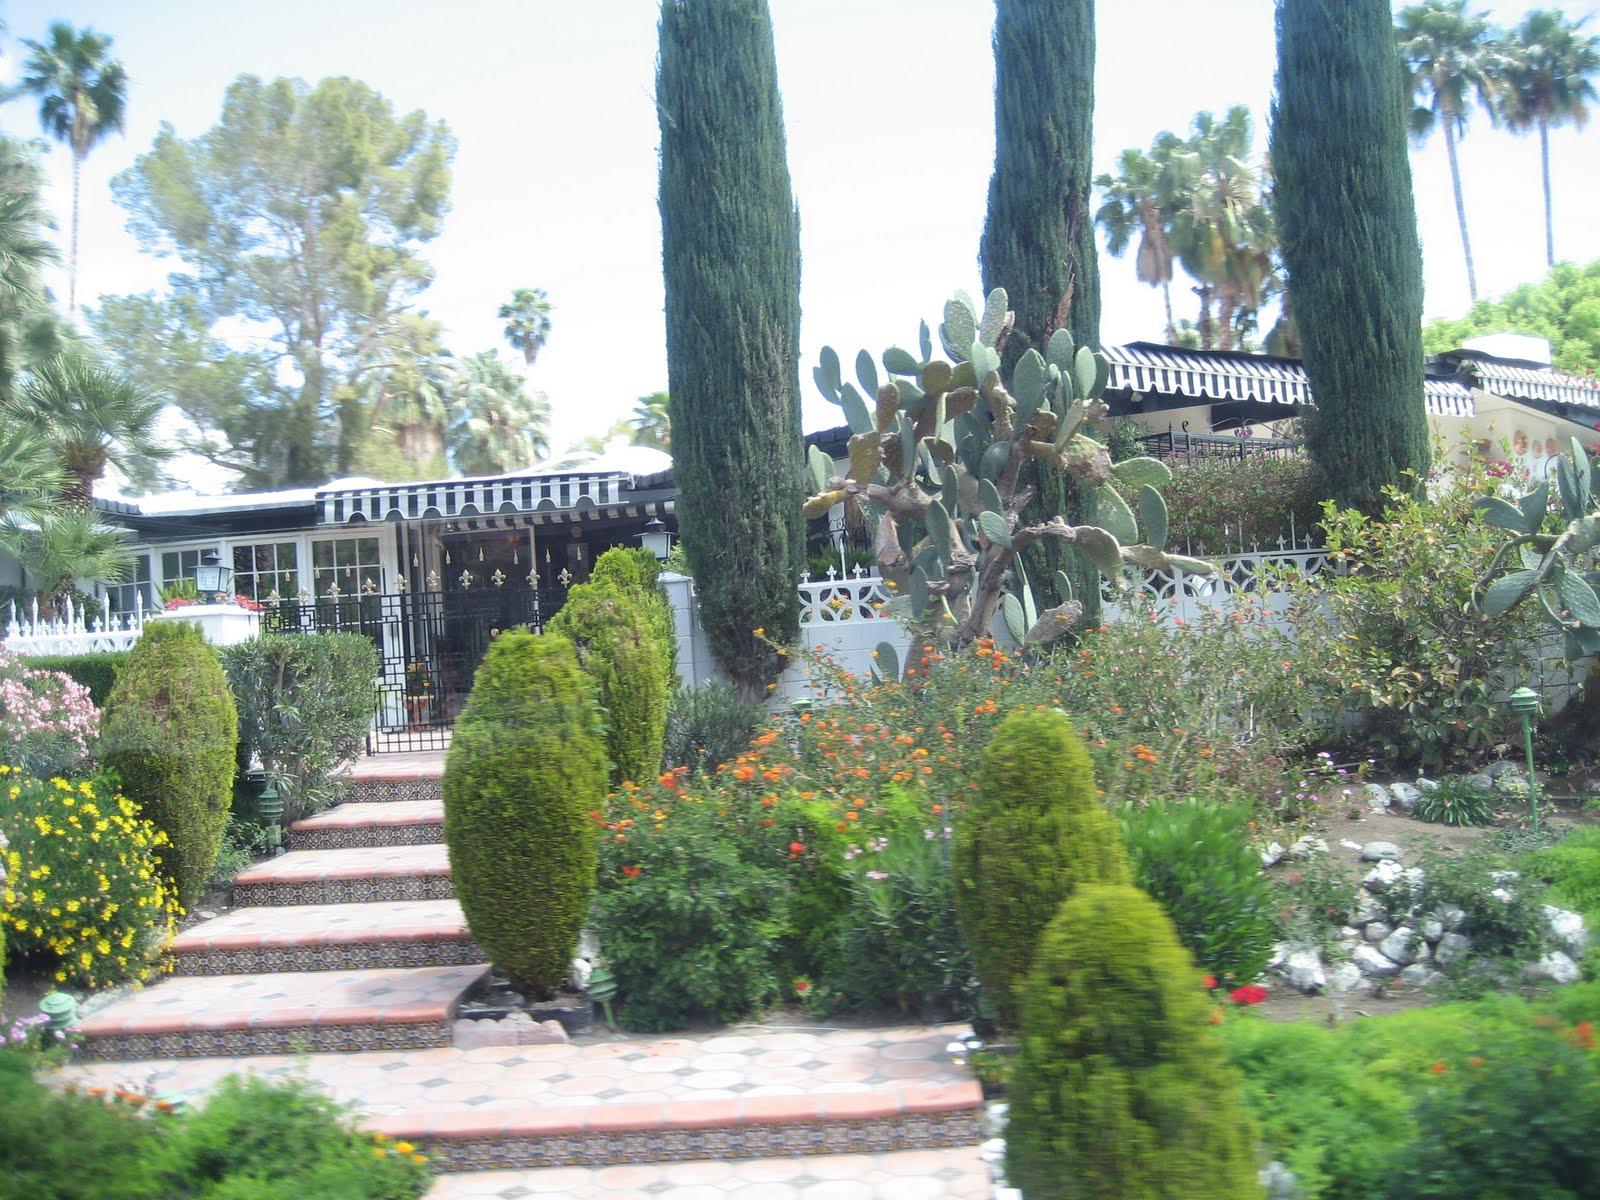 La dolfina palm springs celebrity home tour for Marilyn monroe palm springs home